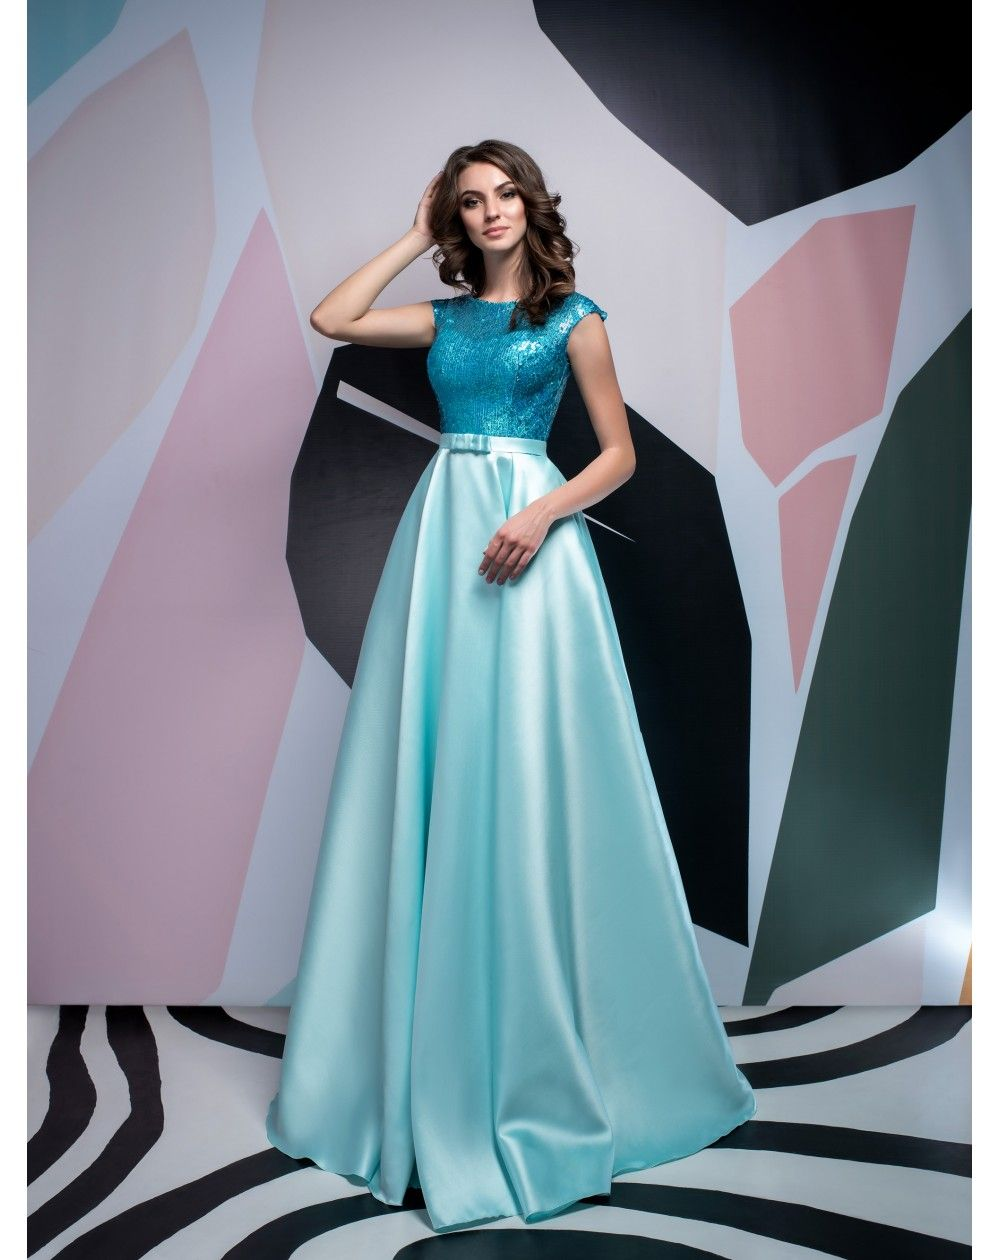 871c4d21f4ba Dlhé luxusné saténové spoločenské šaty s flitrami Isabel vhodné na ples